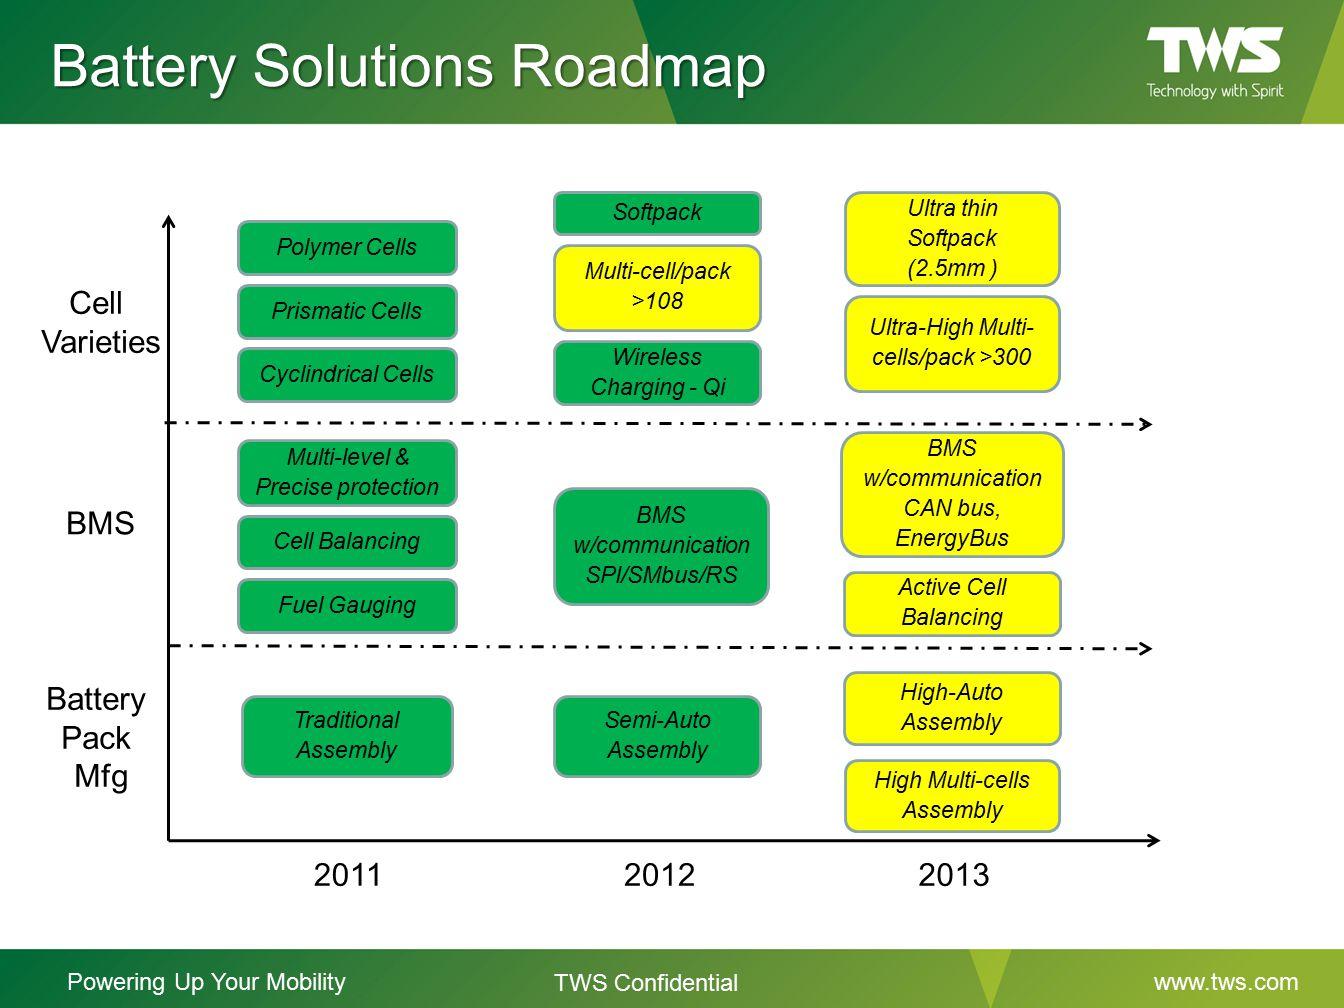 Battery Solutions Roadmap